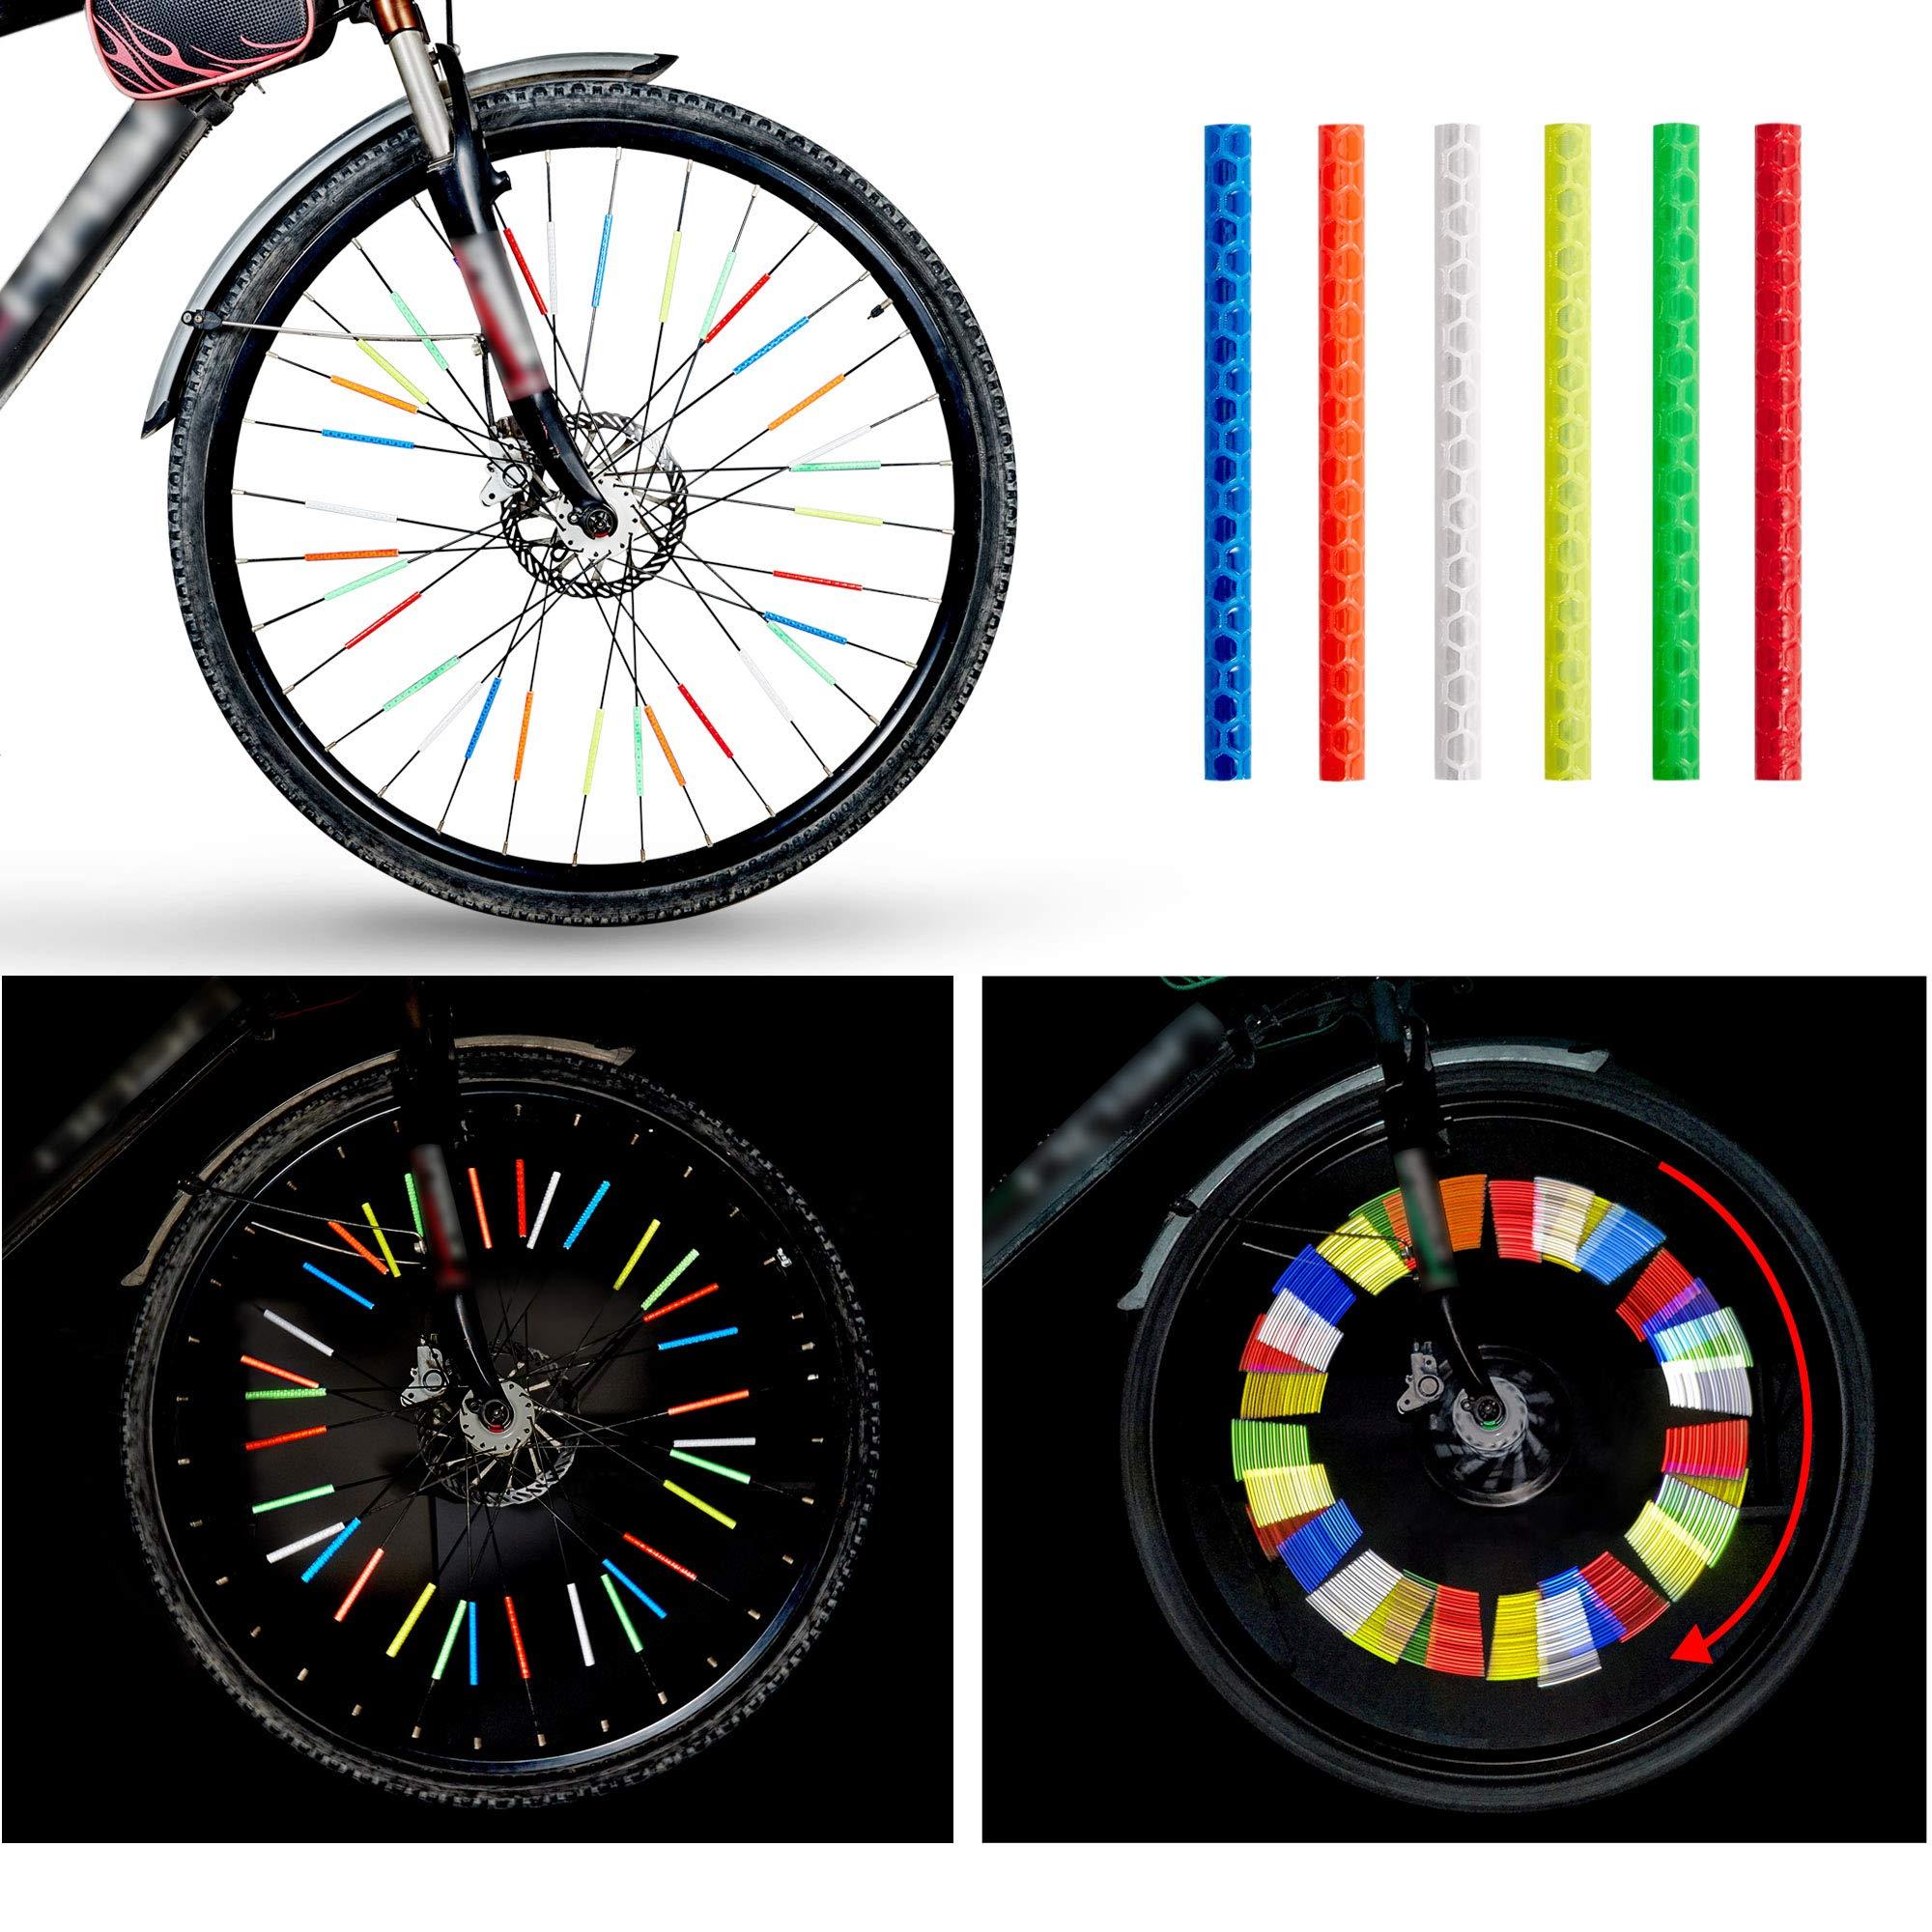 Bike Spoke Reflector Waterproof Riding Bicycle Wheel Reflector Reflective Mount Clip Tube Warning Strip Yunjiadodo 24PCS Bike Reflective Stickers Clips